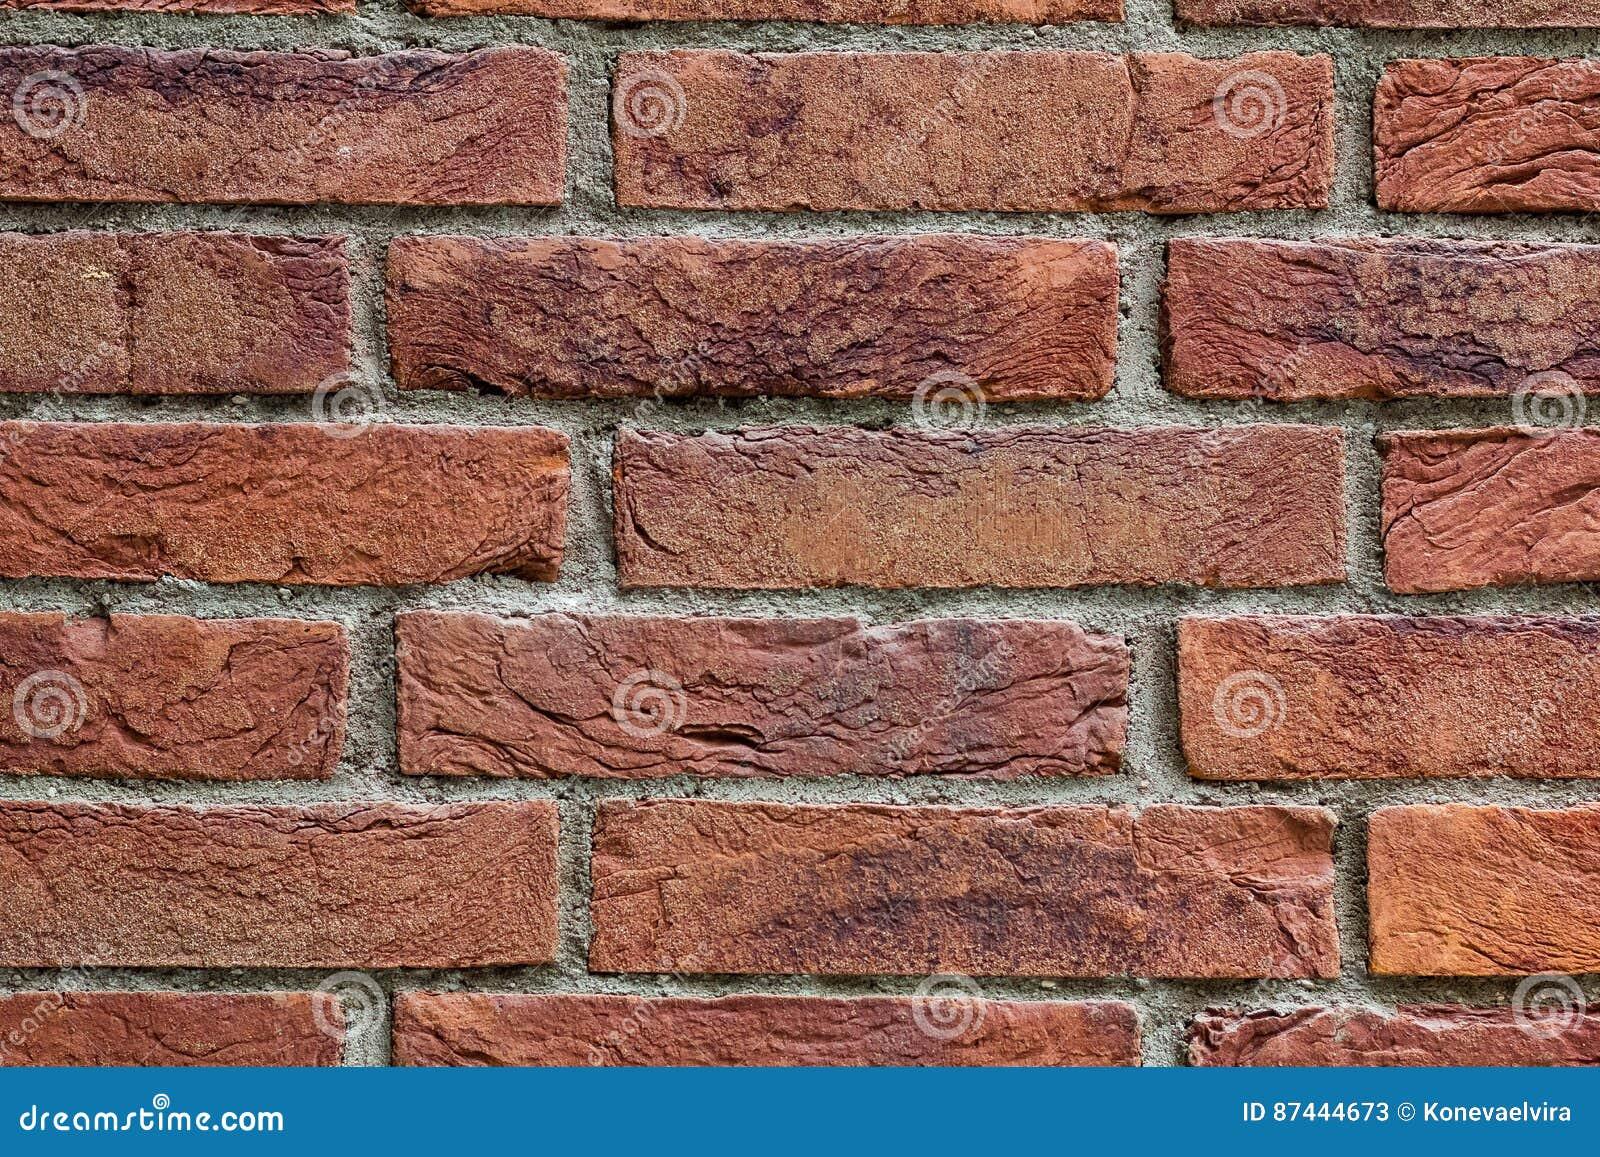 Close Up Of An Old Exterior Brick Wall Stock Image